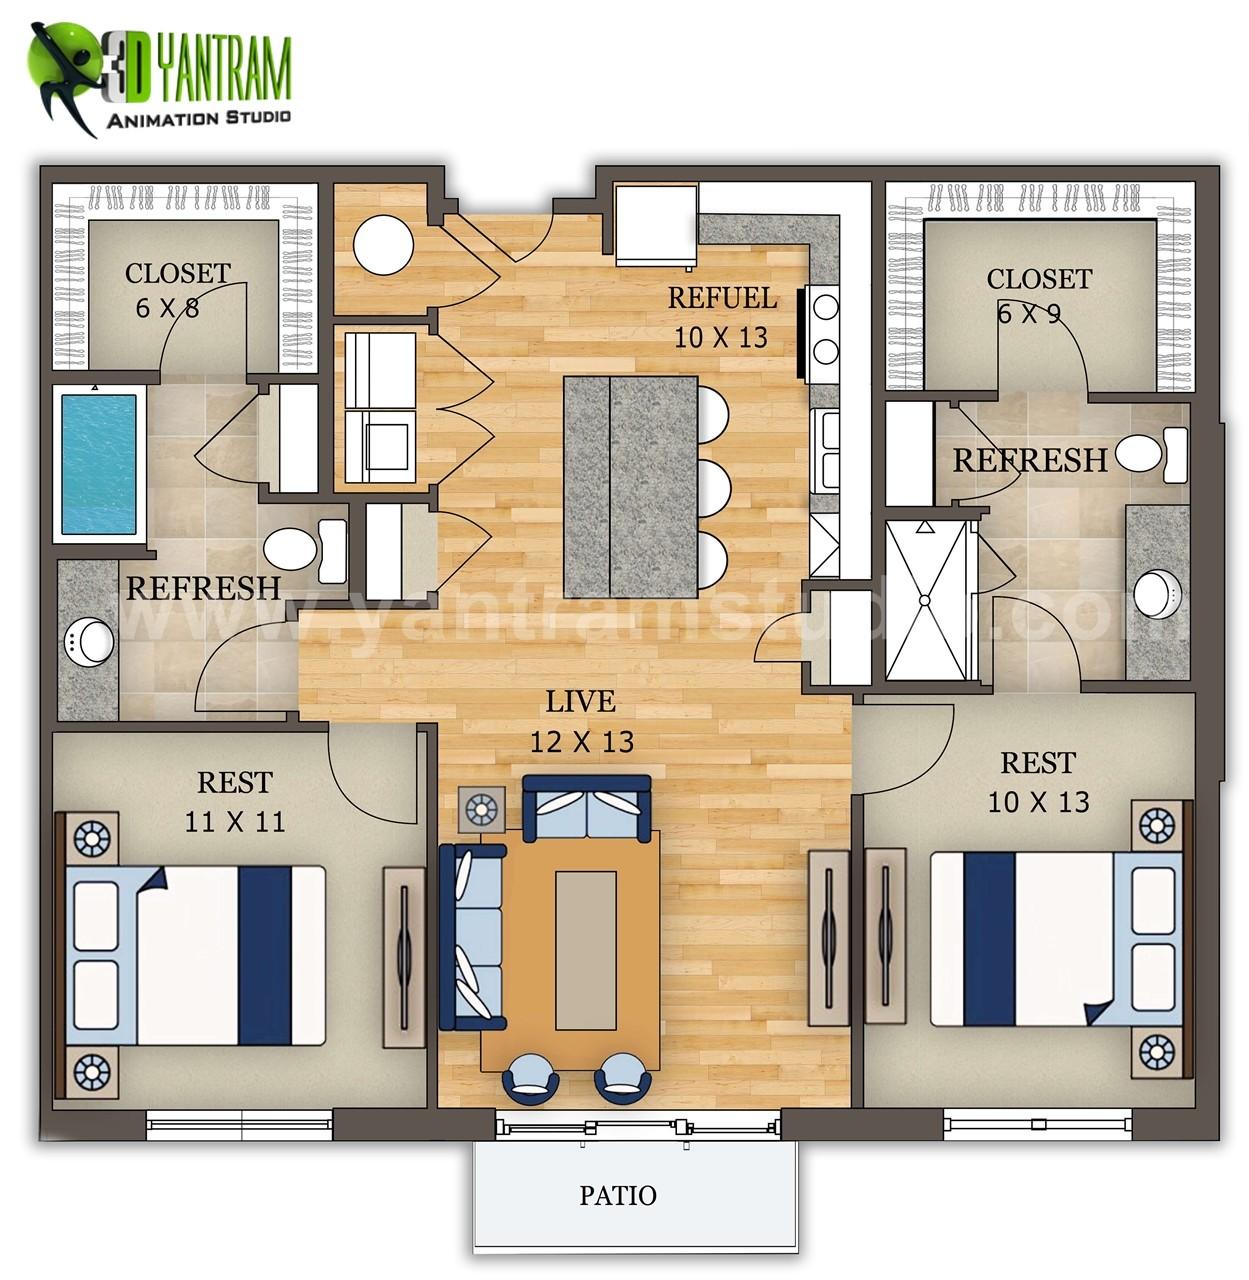 Artstation 2d Home Interactive Floor Plan Design By Architectural Studio New York Usa Yantram Architectural Design Studio